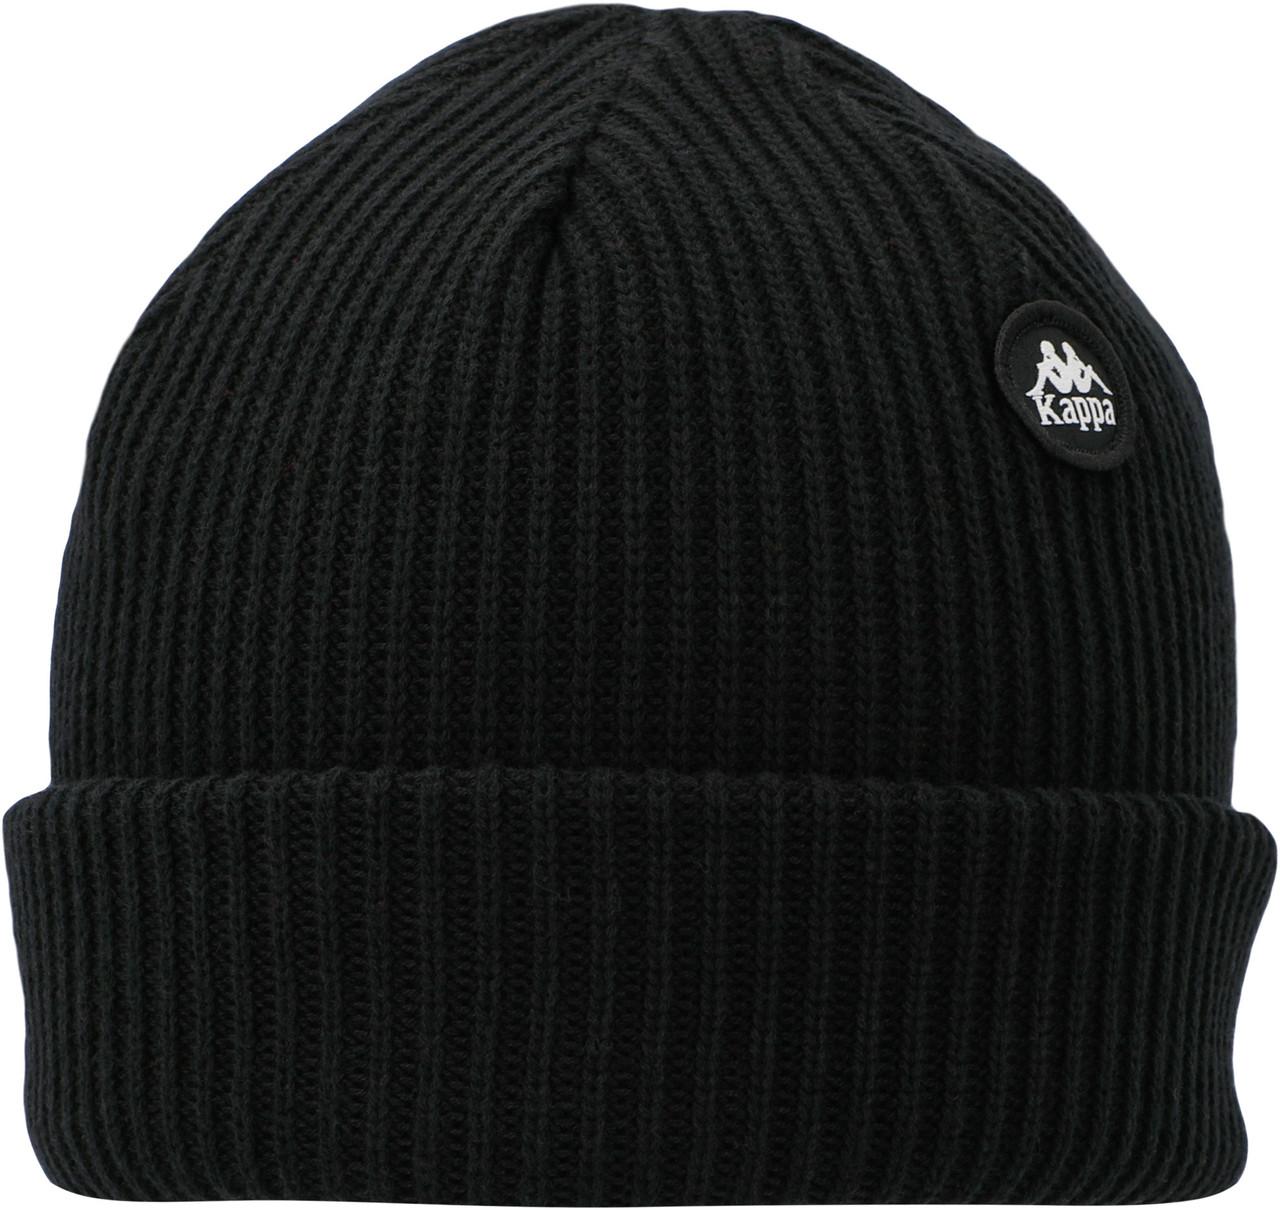 Черная шапка Kappa